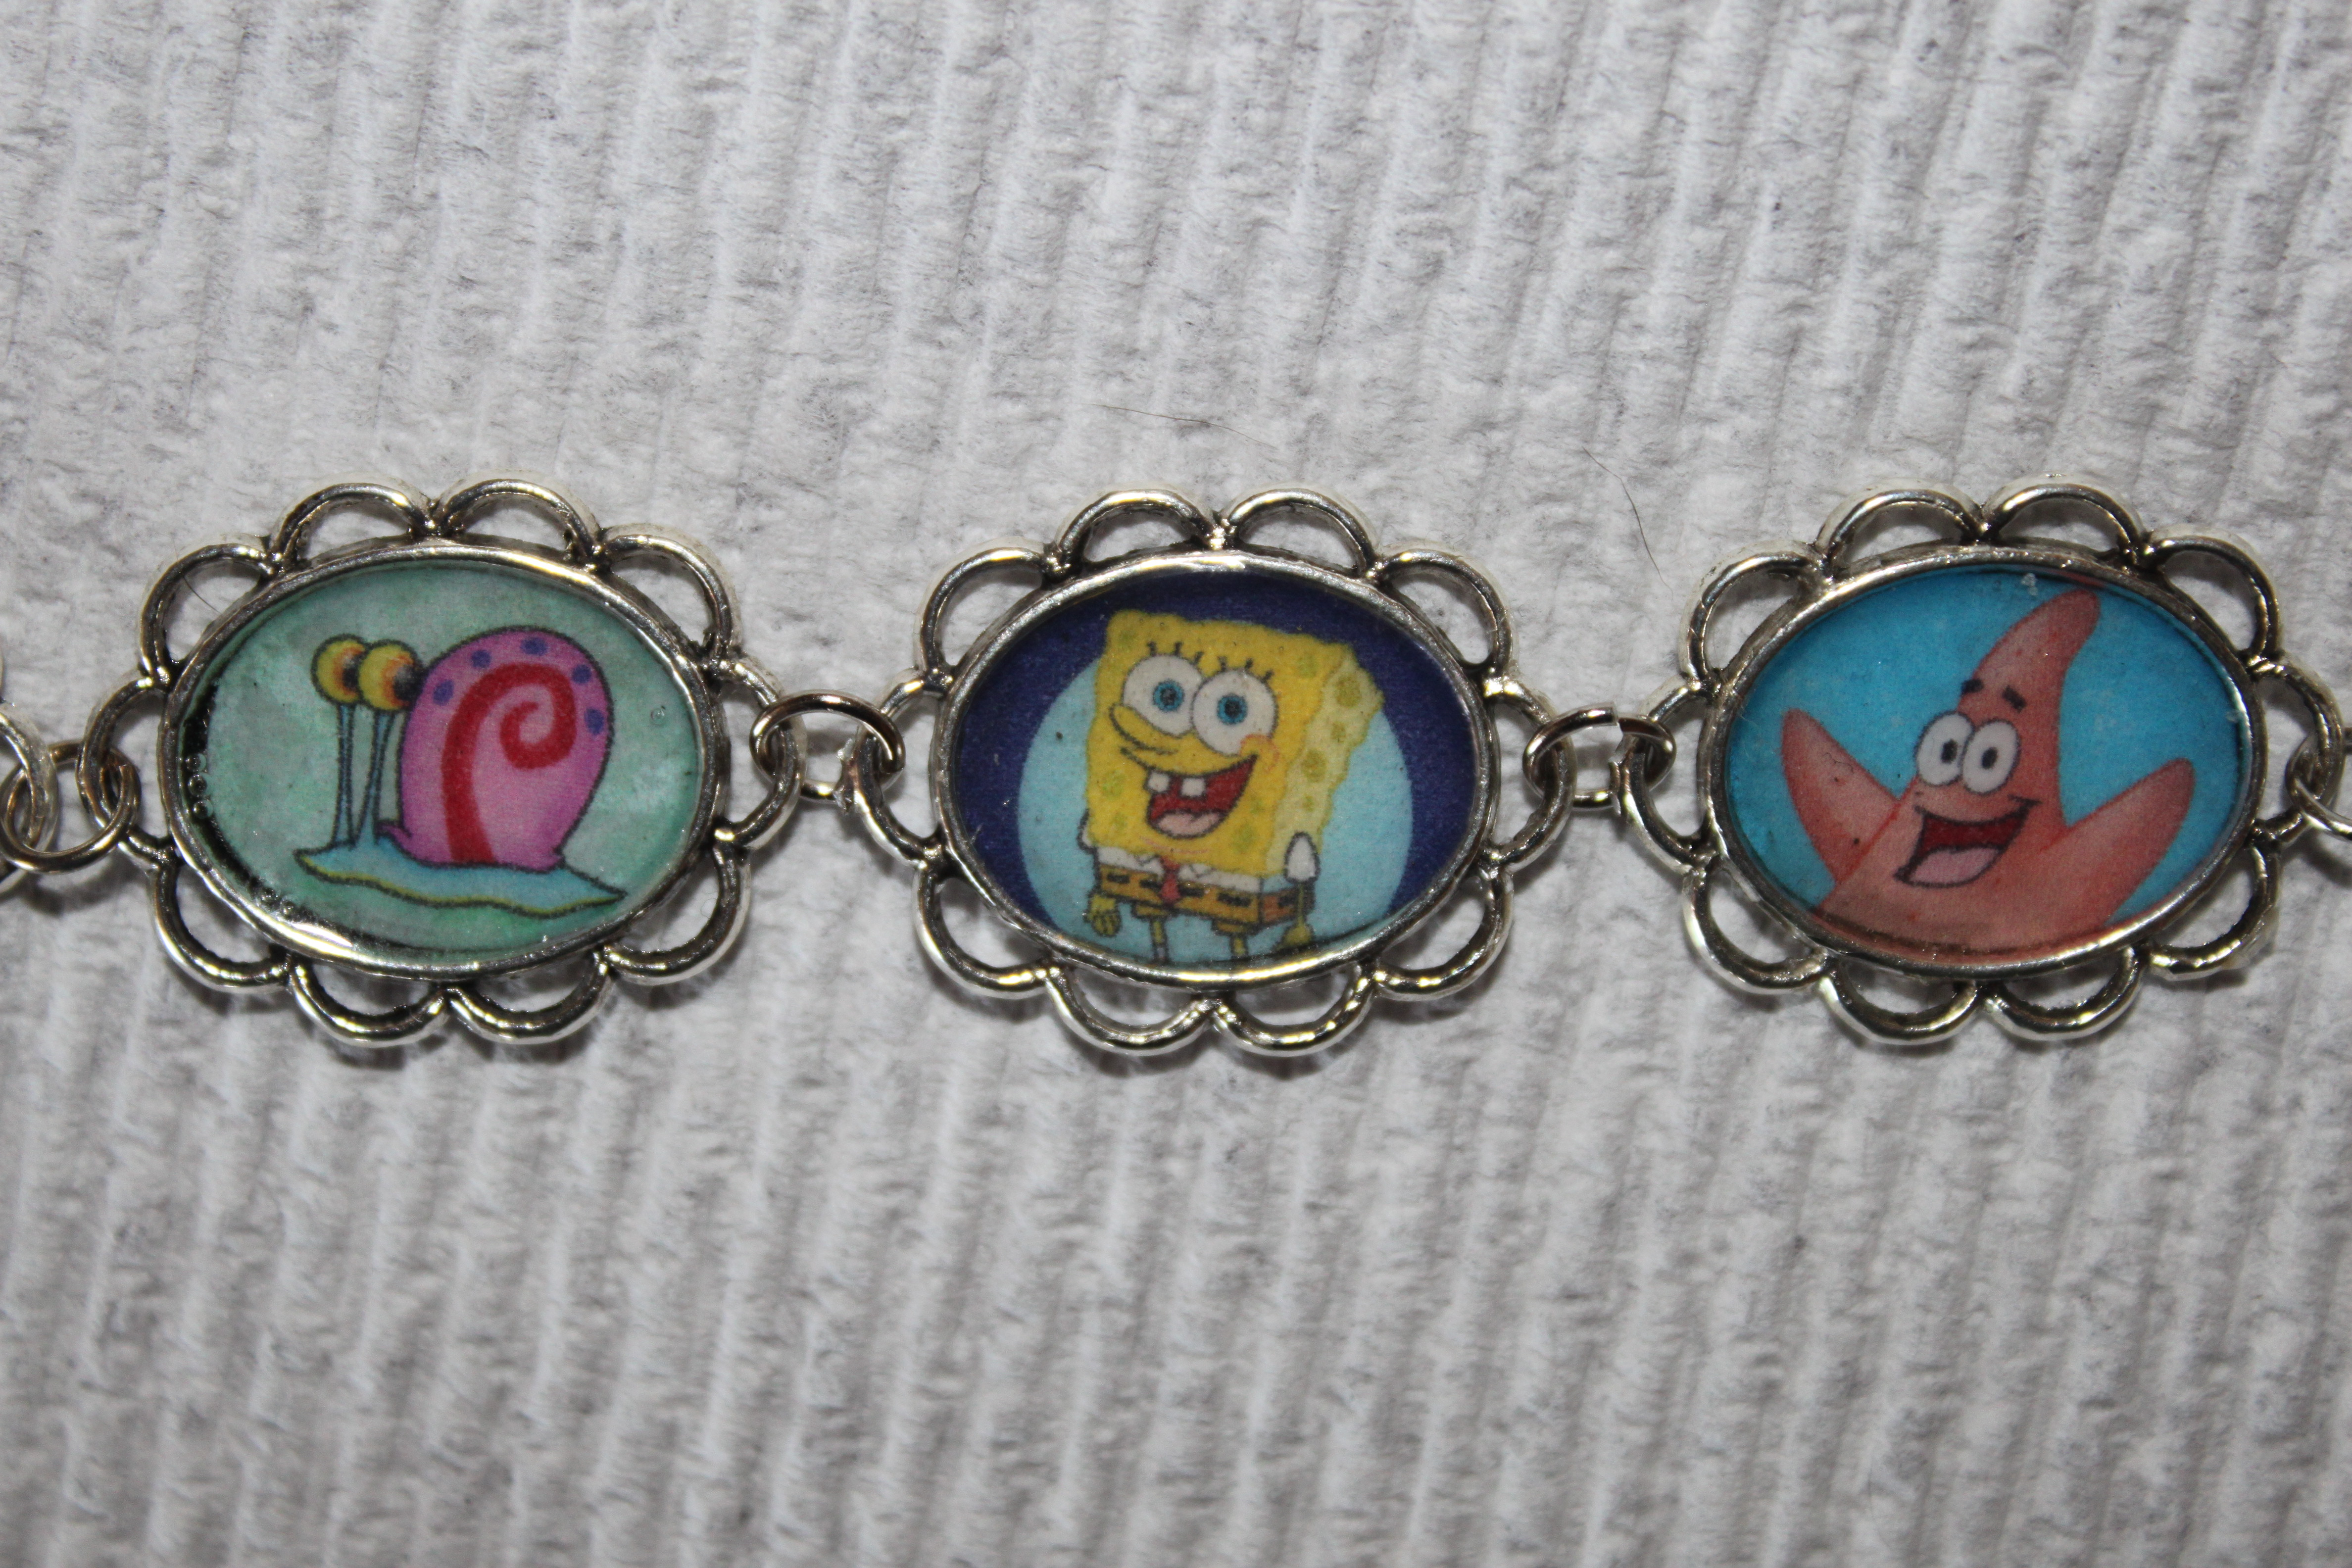 Spongebob Squarepants bracelet